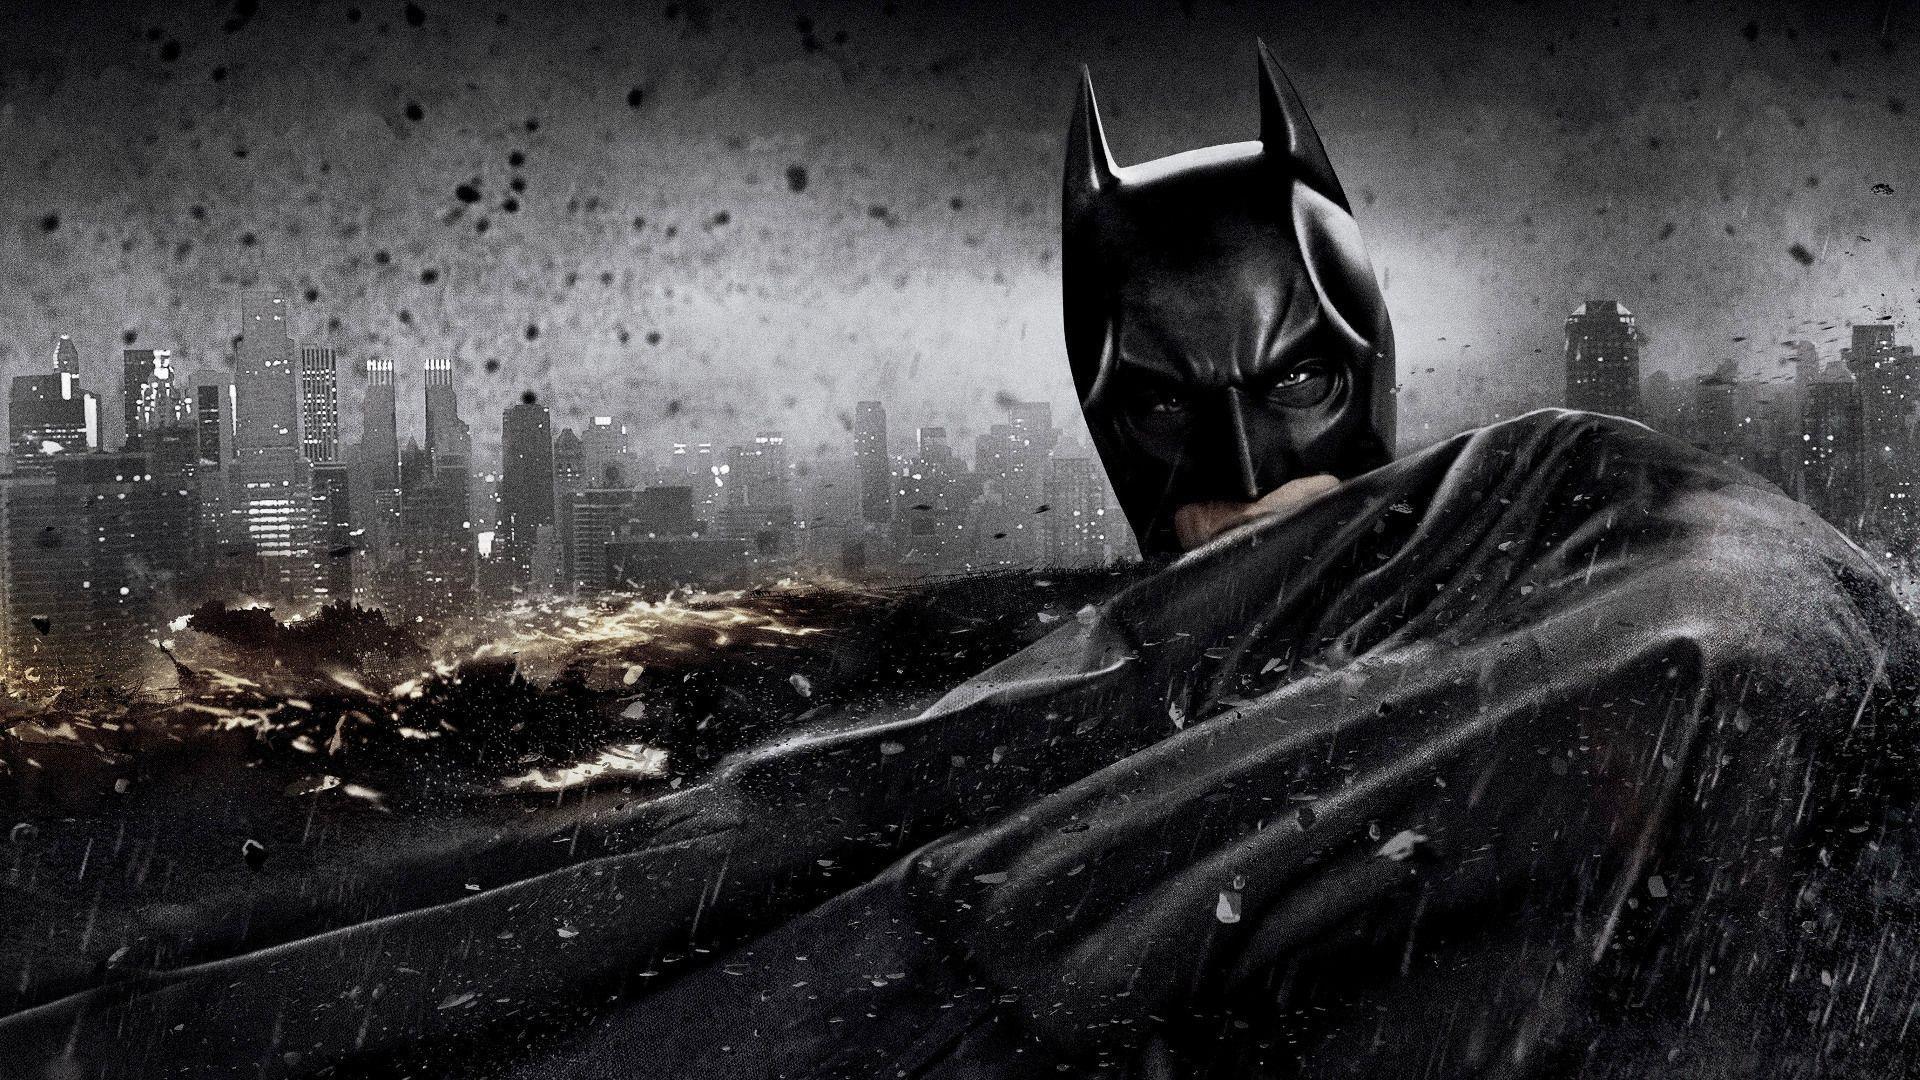 Dark Knight Hd Wallpapers Top Free Dark Knight Hd Backgrounds